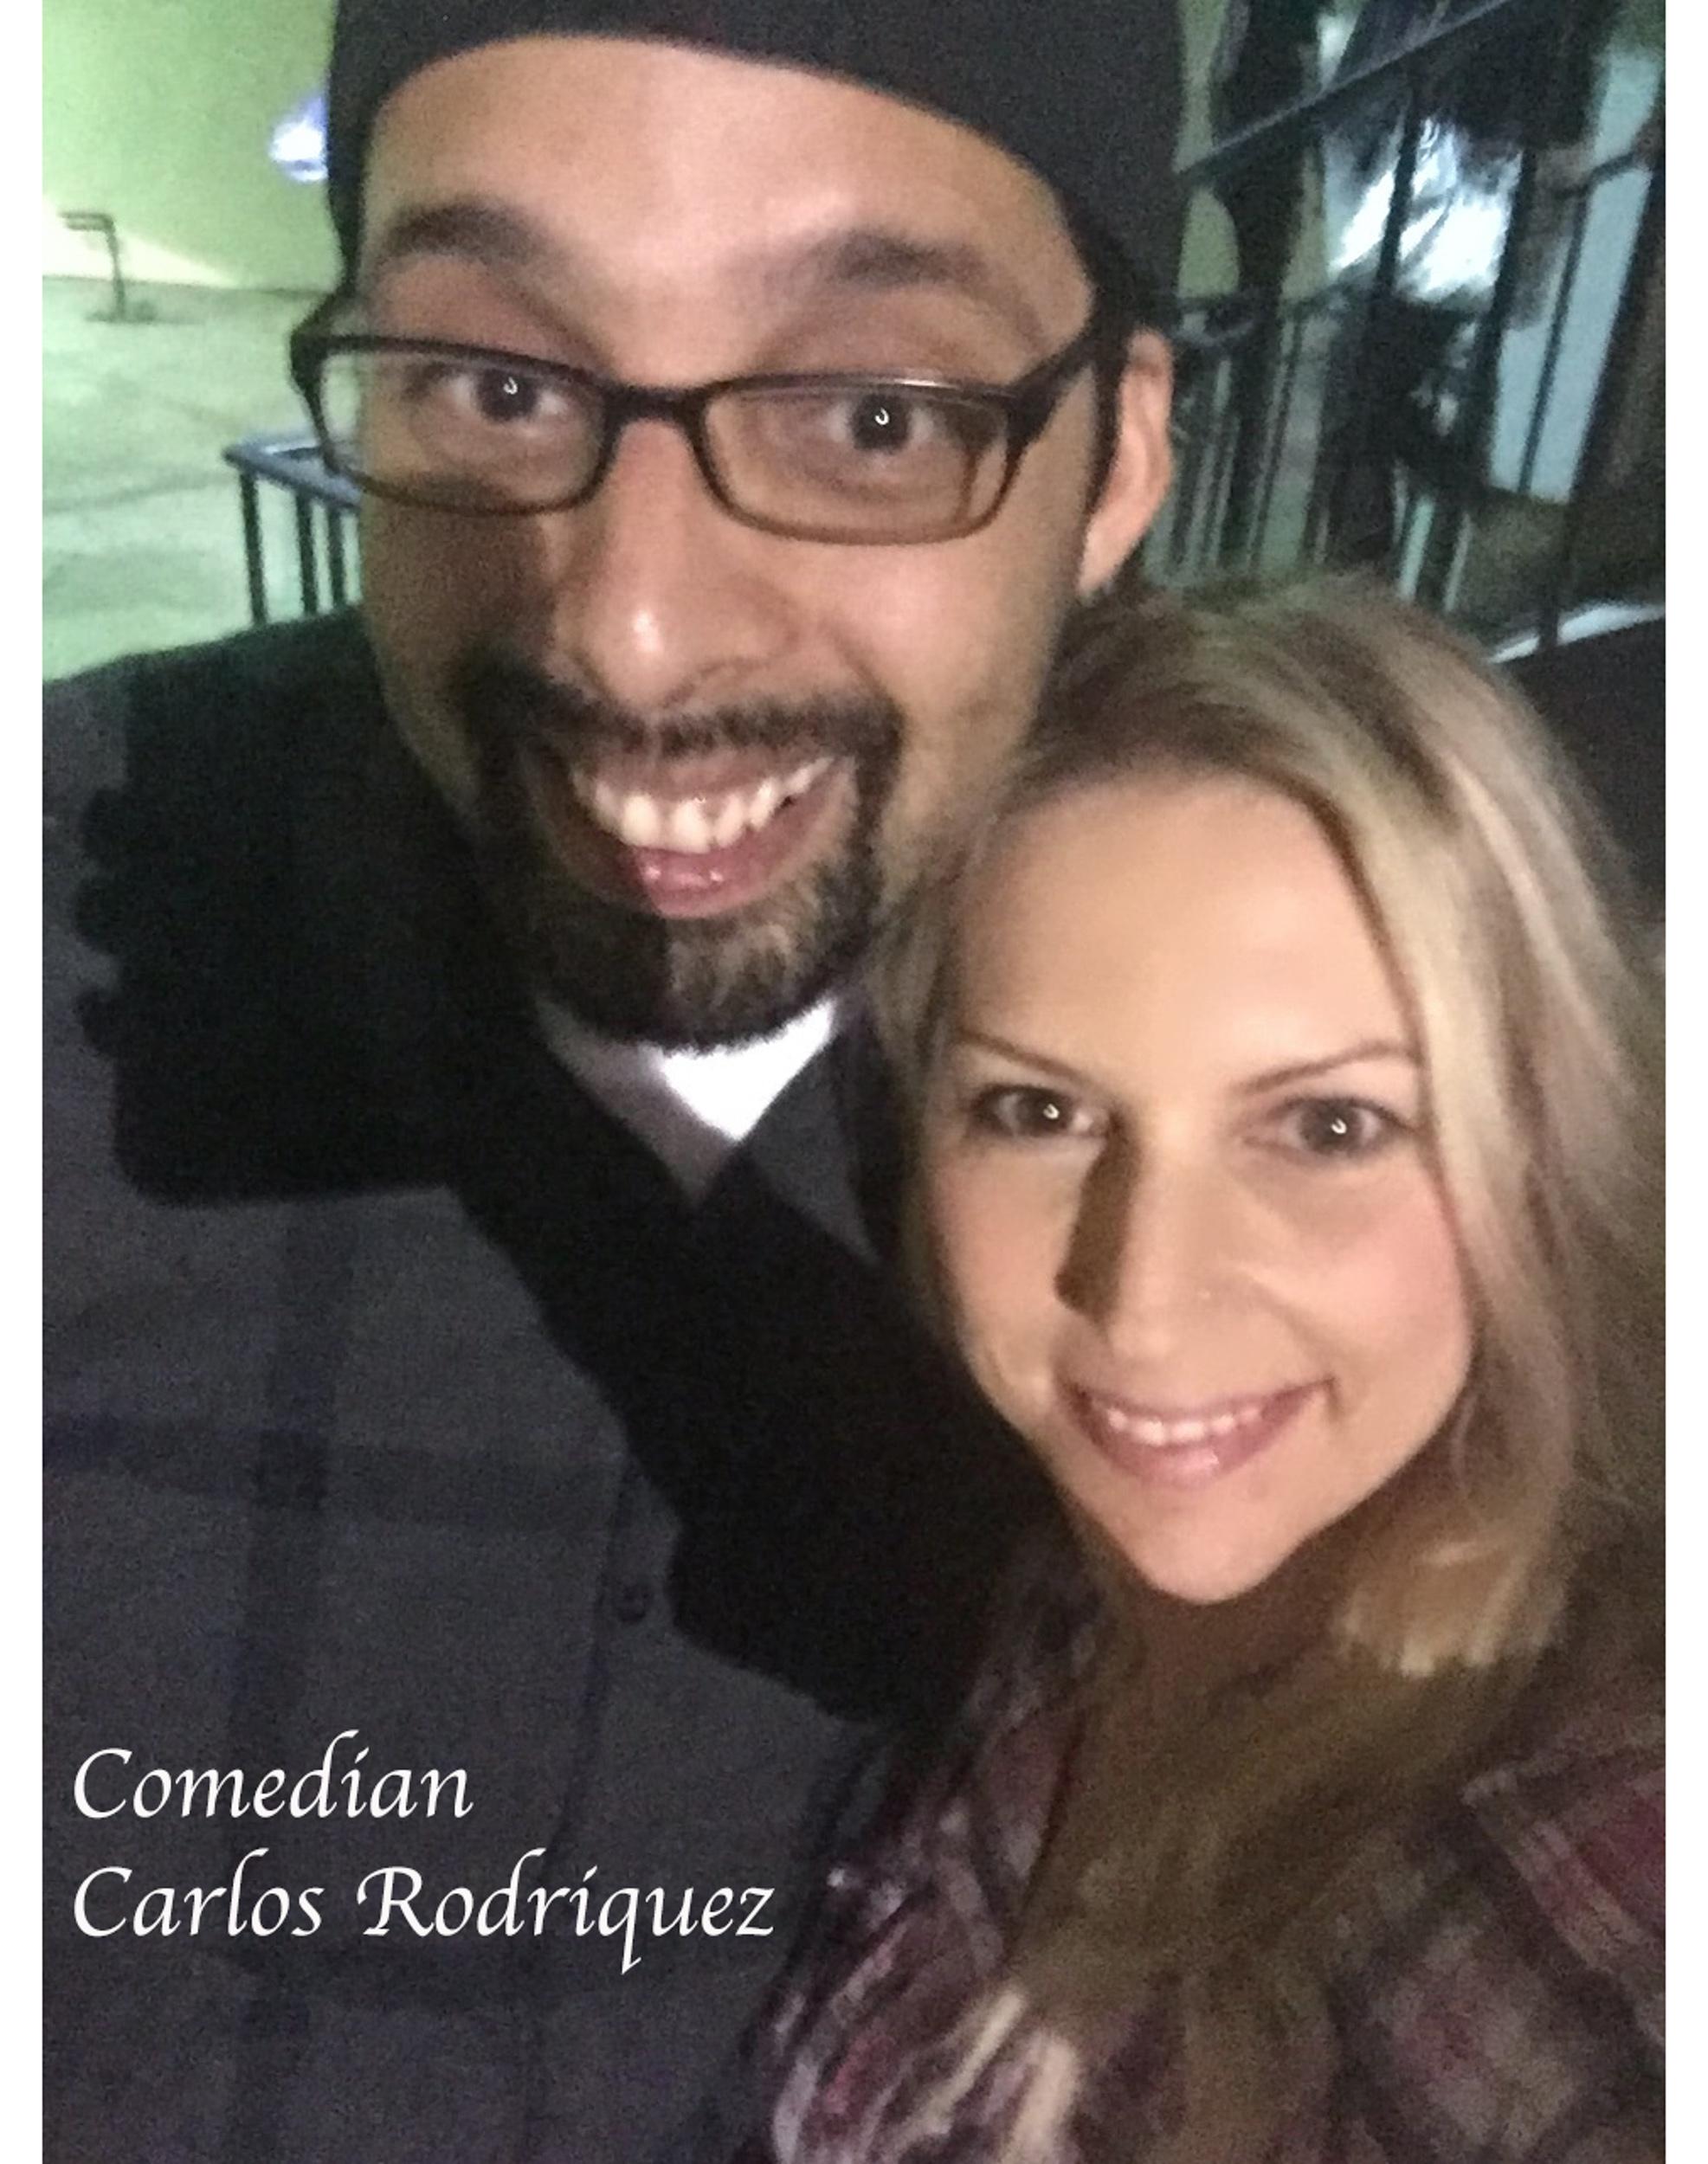 comedian Carlos Rodriguez-Edit.jpg